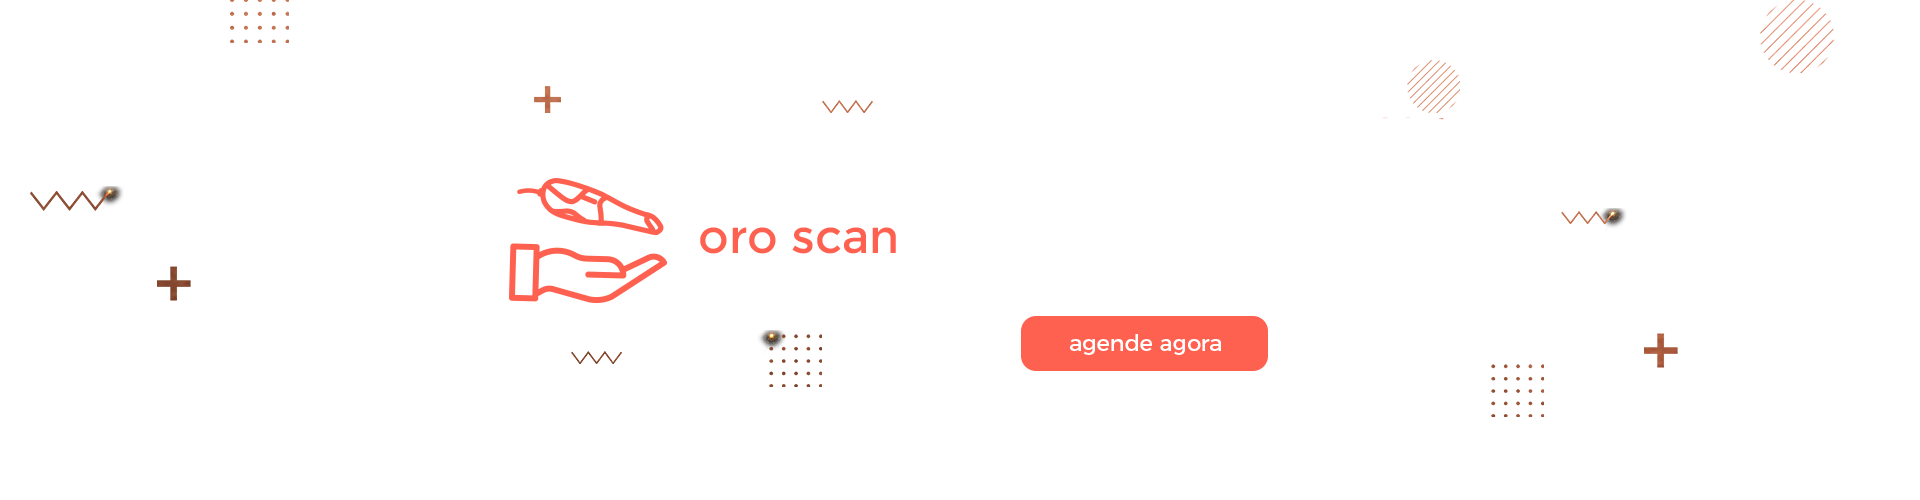 Banner Oro Scan Escaneamento Intraoral be-in